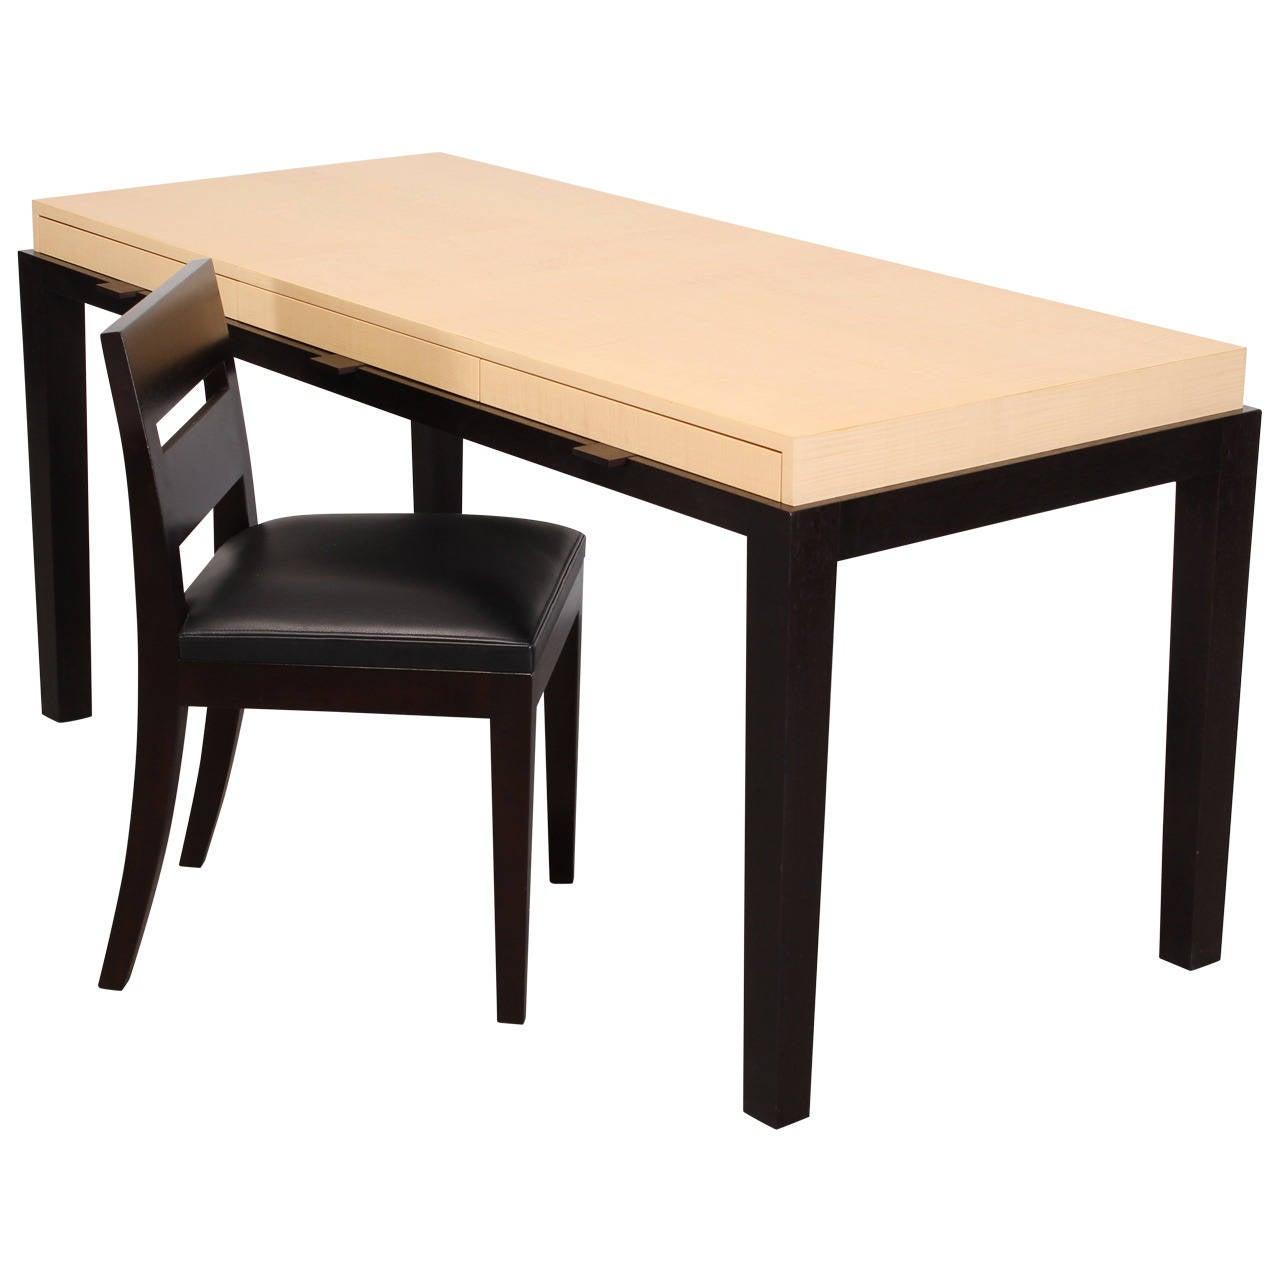 christian liaigre desk and chair bureau monsieur 1995 2003 at 1stdibs. Black Bedroom Furniture Sets. Home Design Ideas